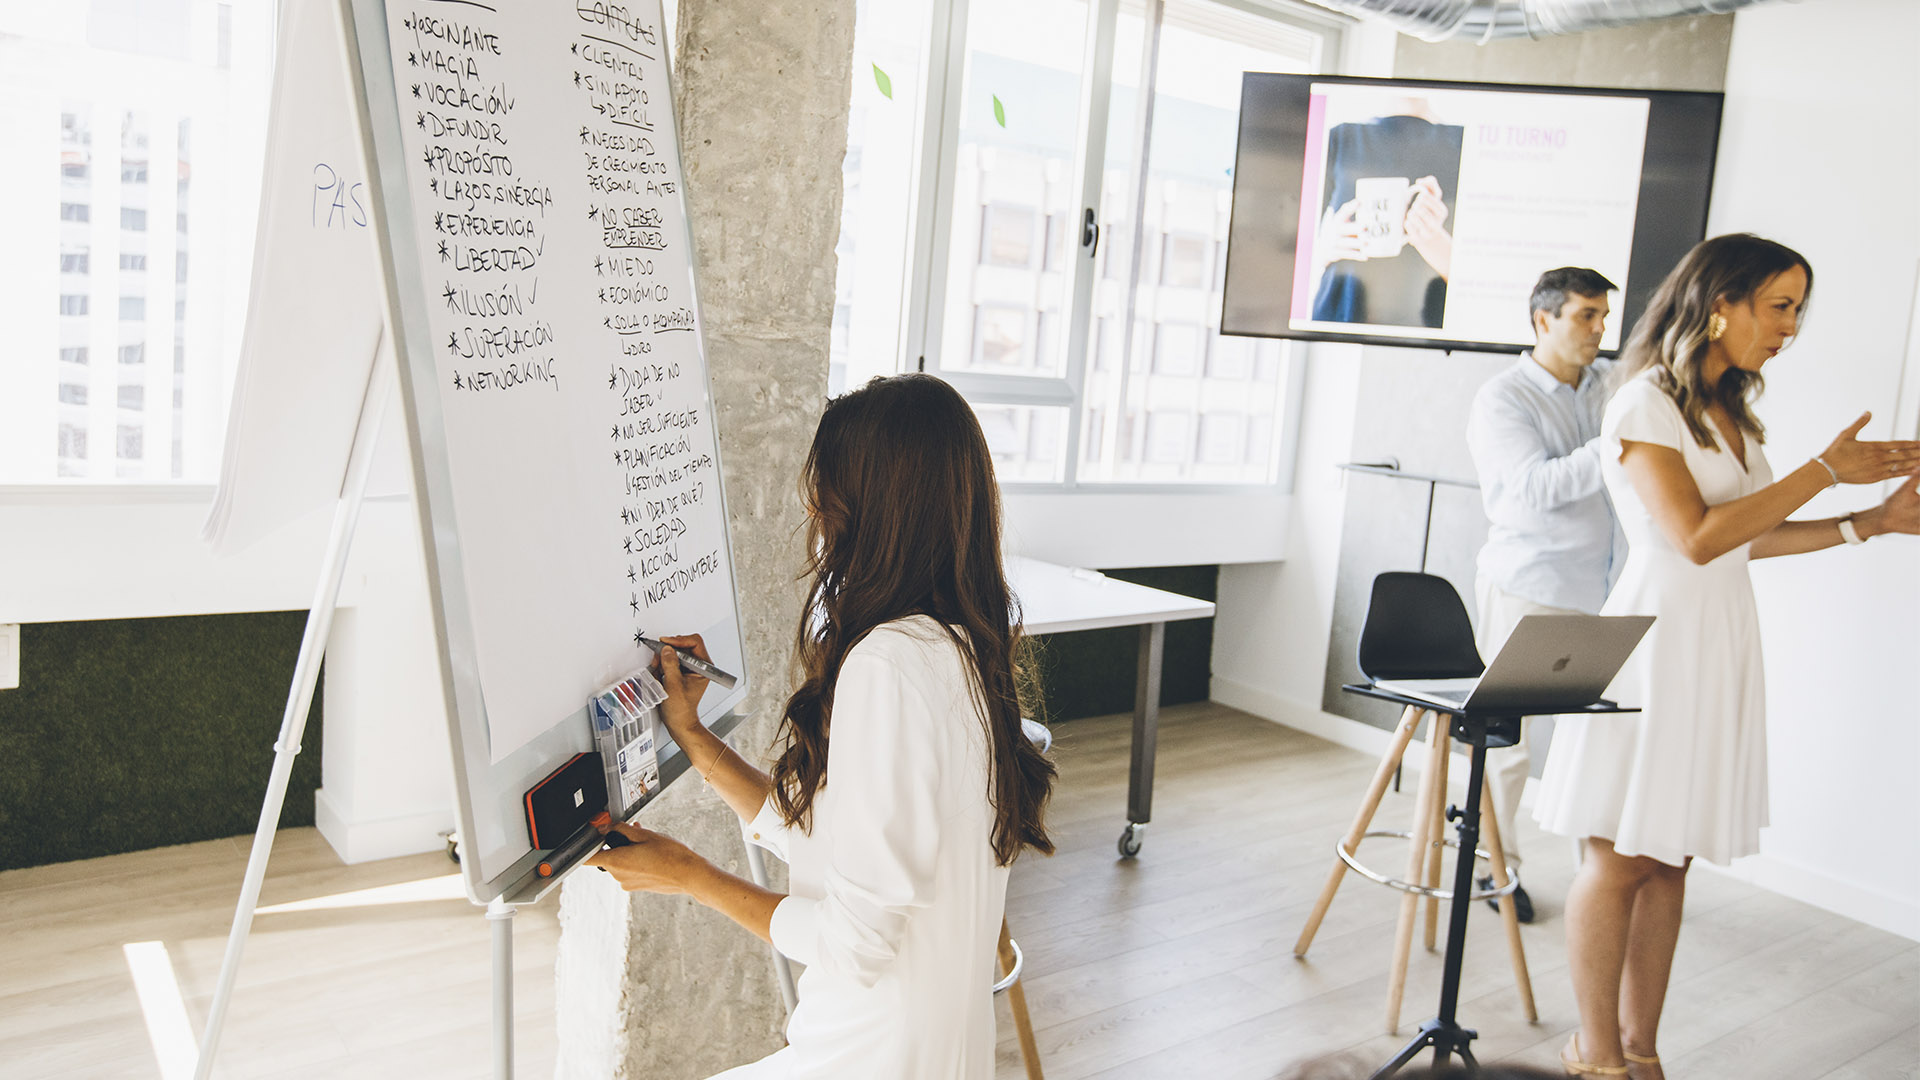 Eventos de Empresa -Smart Corworking - Fotografía LifeStyle Business